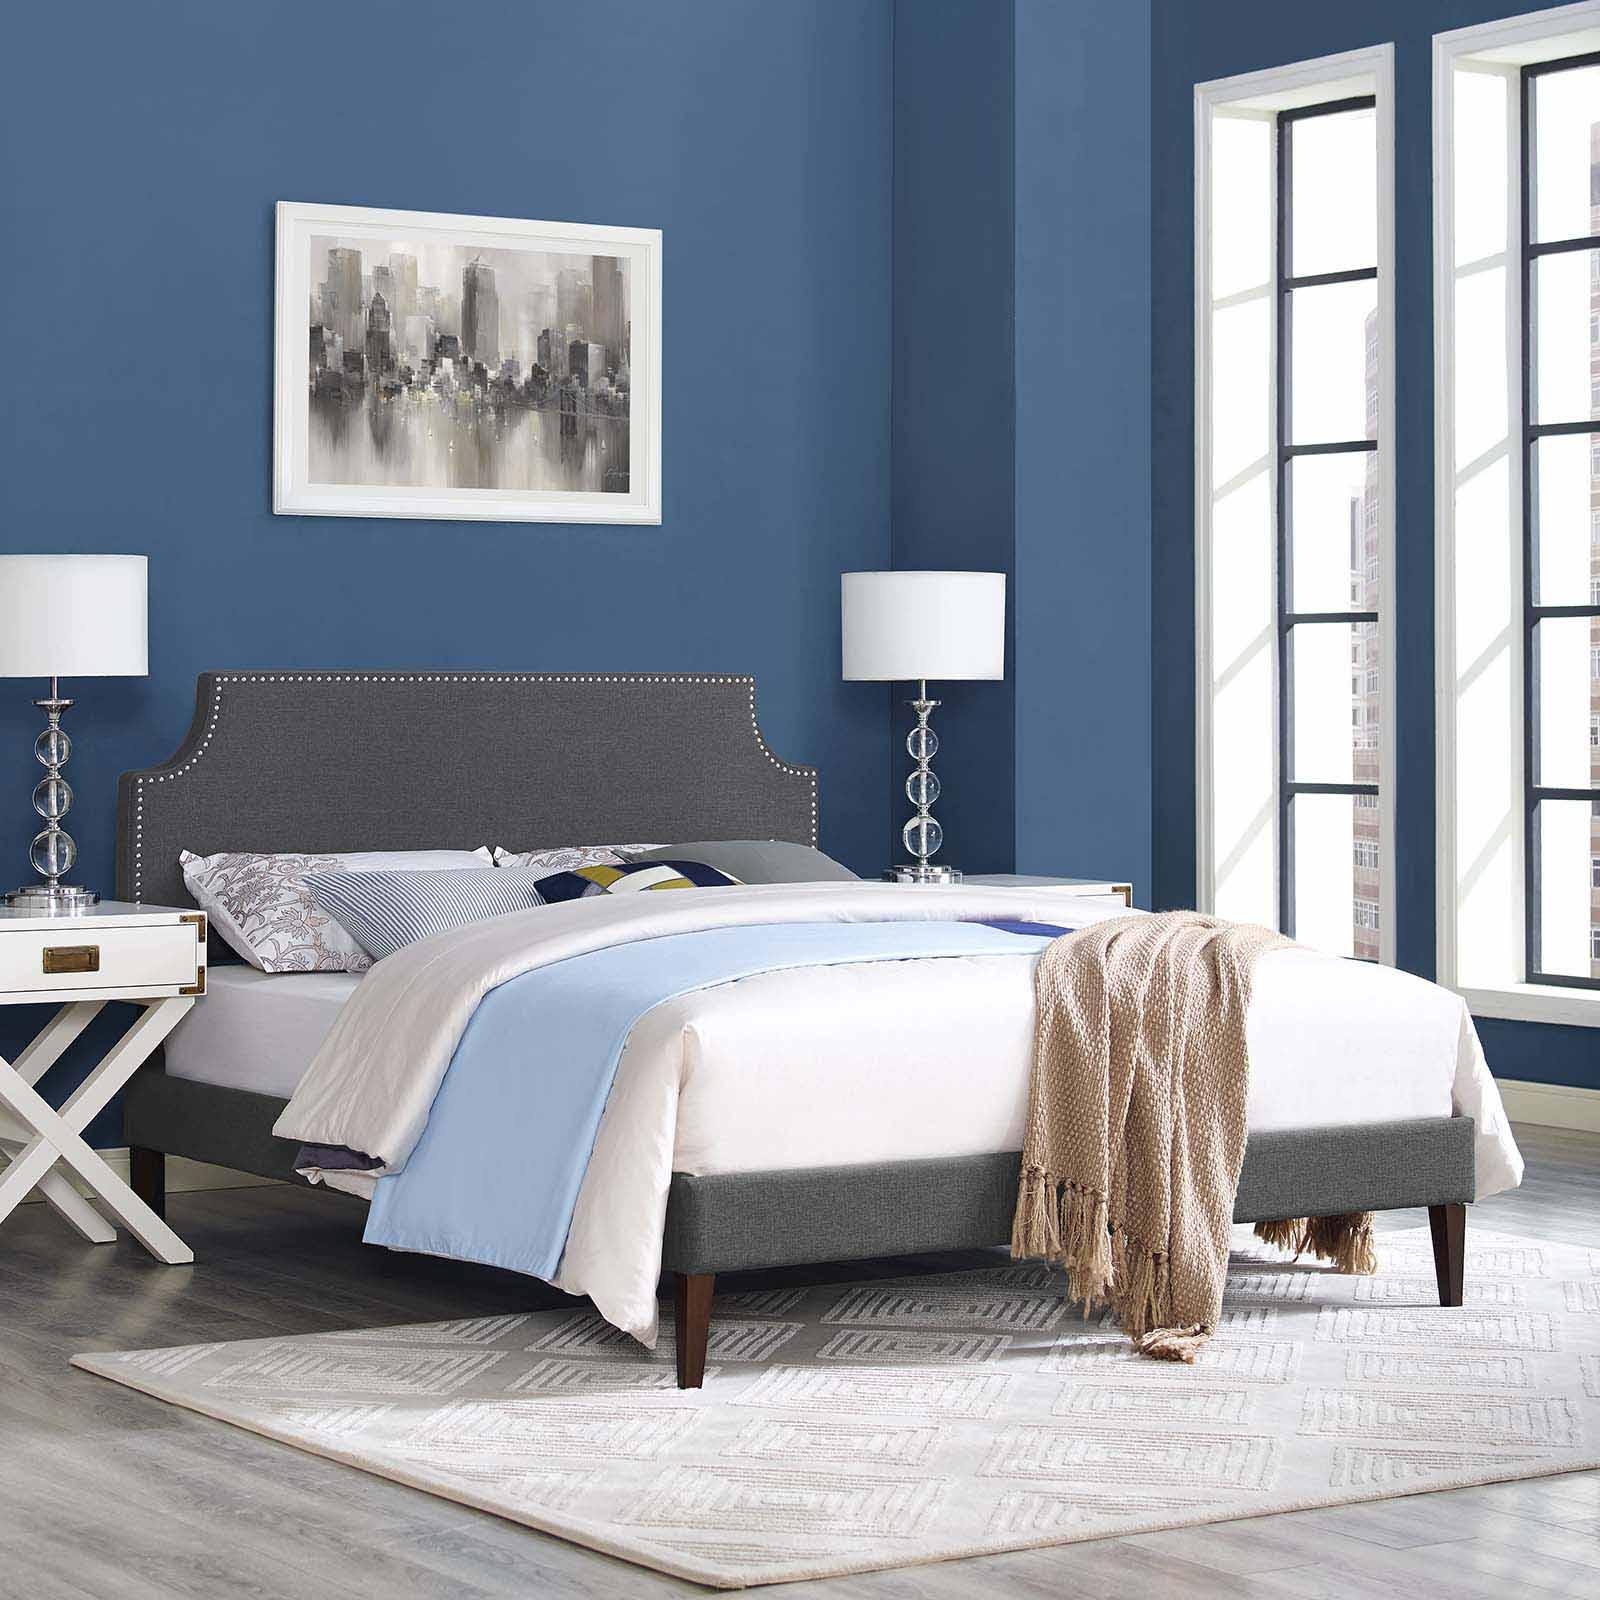 Modterior Bedroom Beds Corene King Fabric